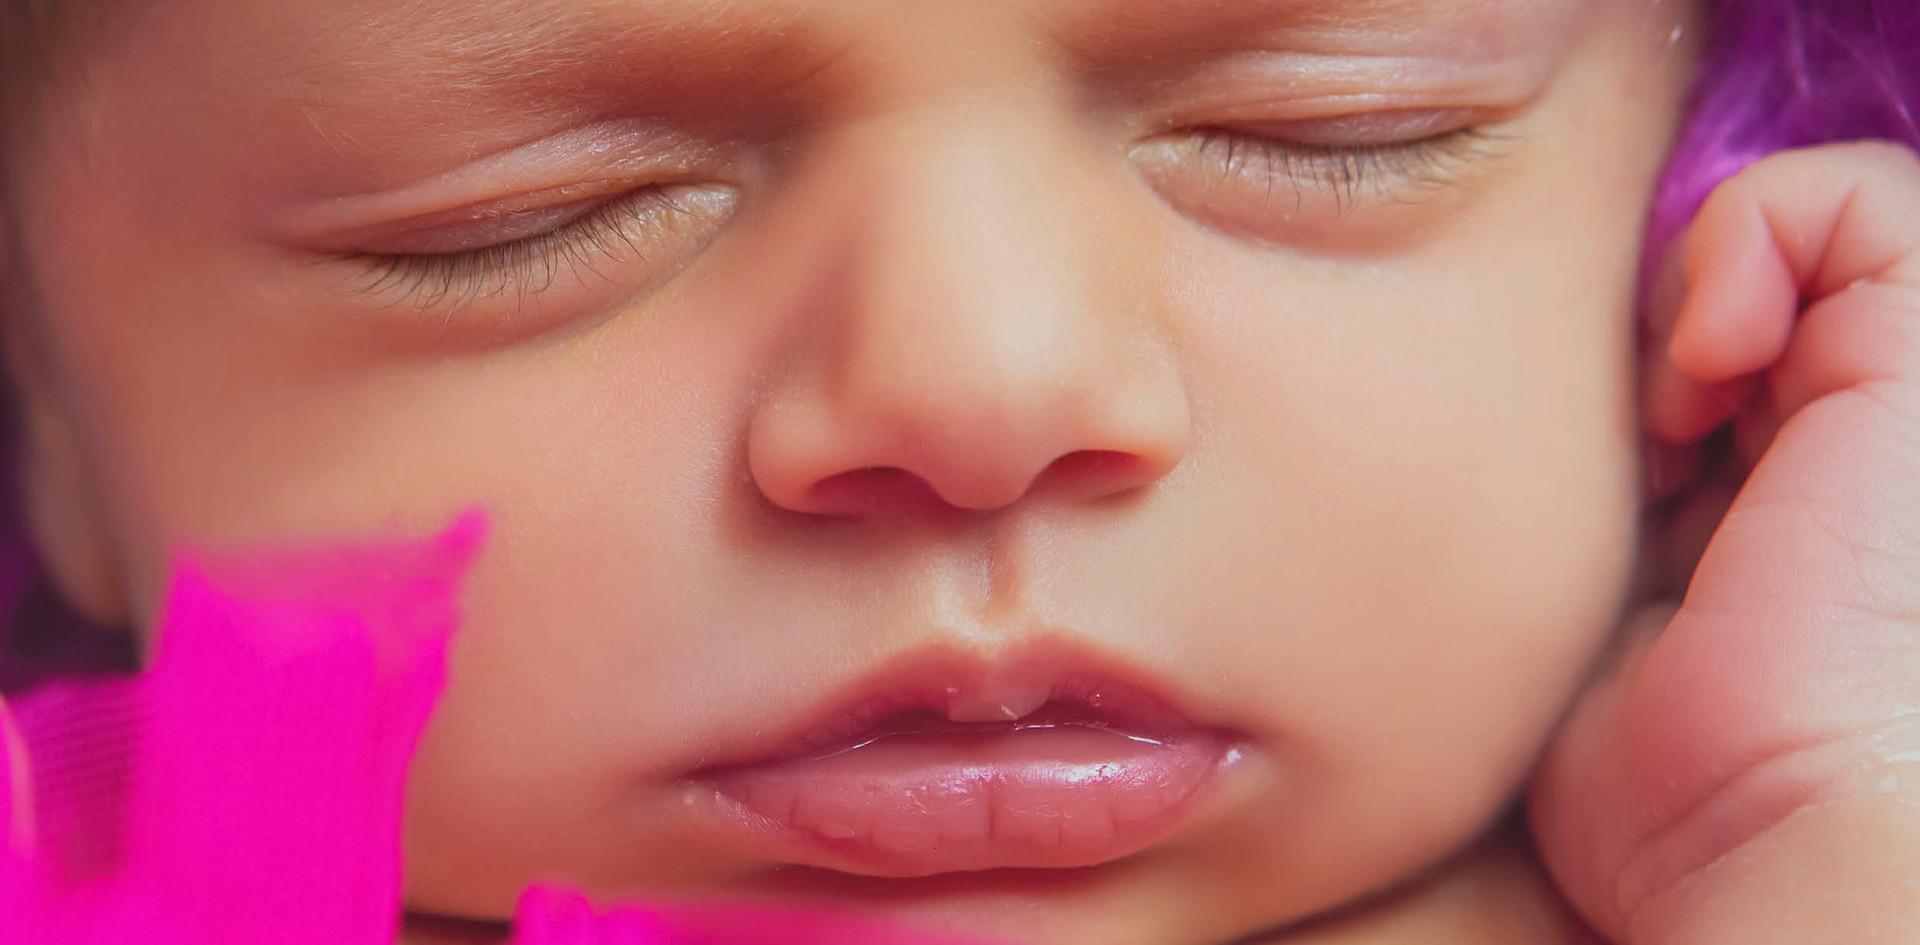 varie5 neonati e battesimi - fotografo n